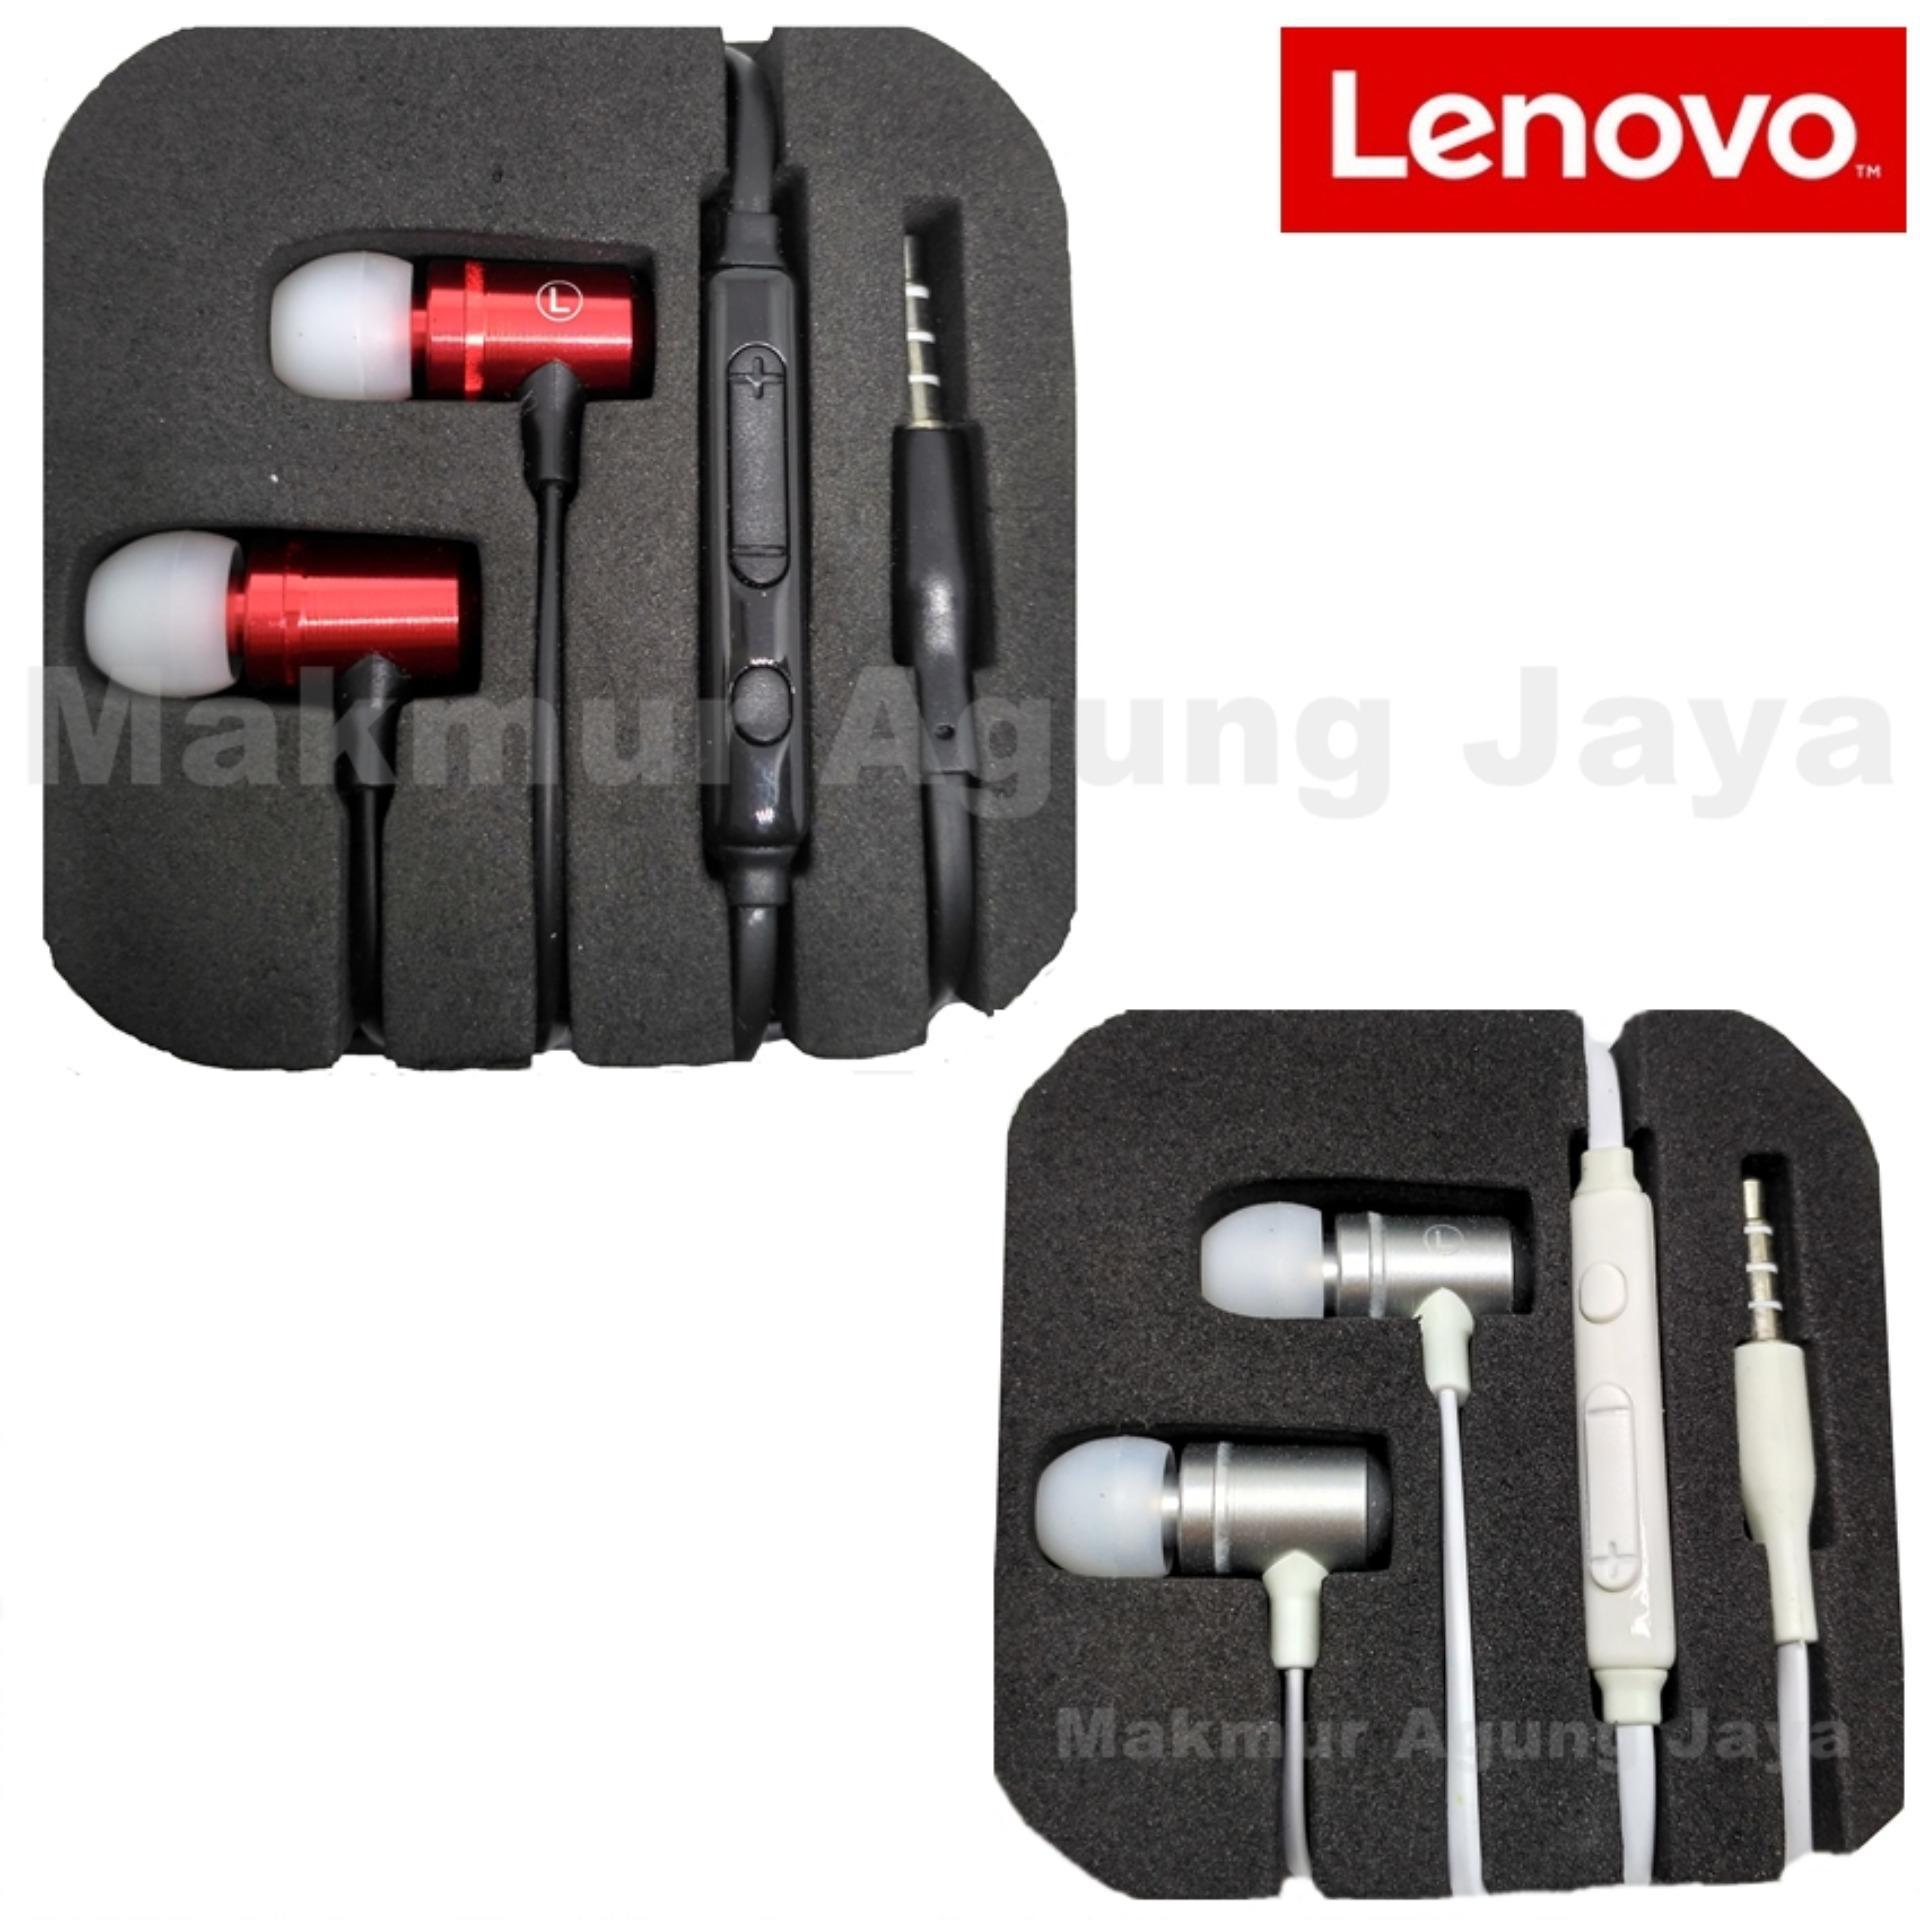 Lenovo Handsfree Headset Earphone Limitid Edition Original Big Bass Generation - Merah / Red .